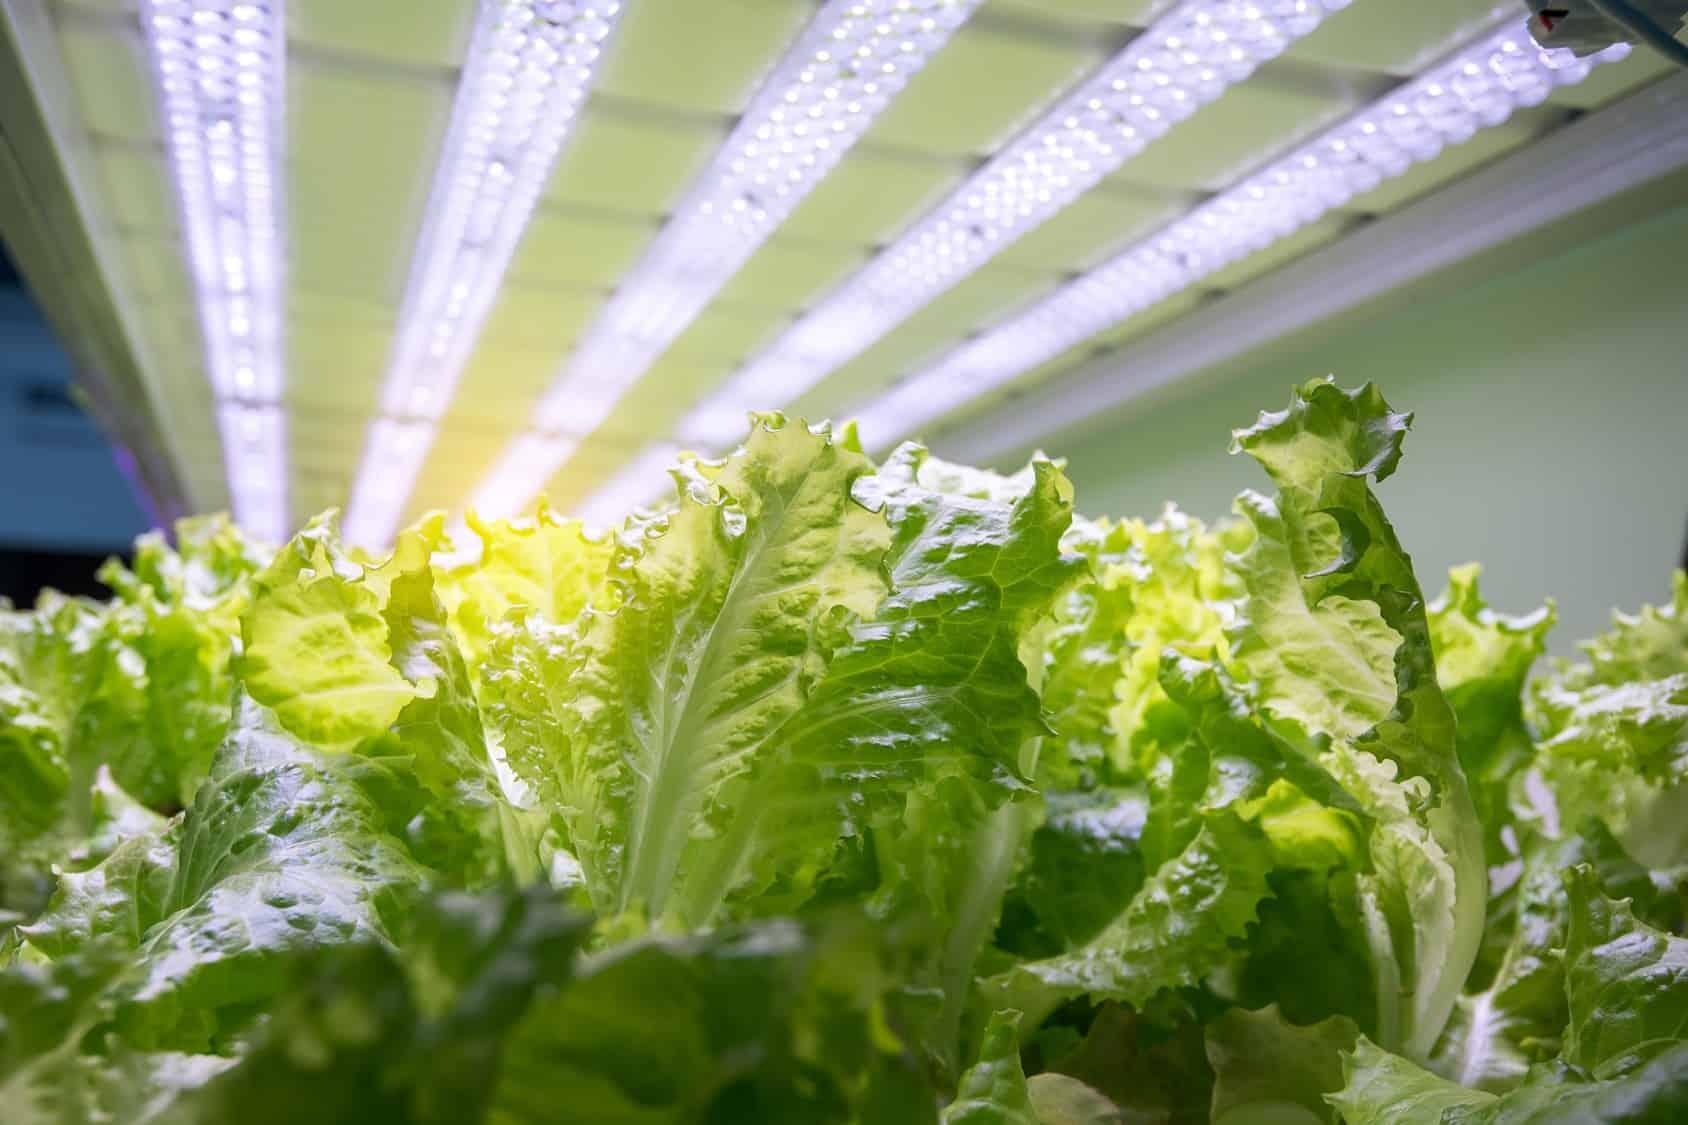 Hydroponics lettuce farm